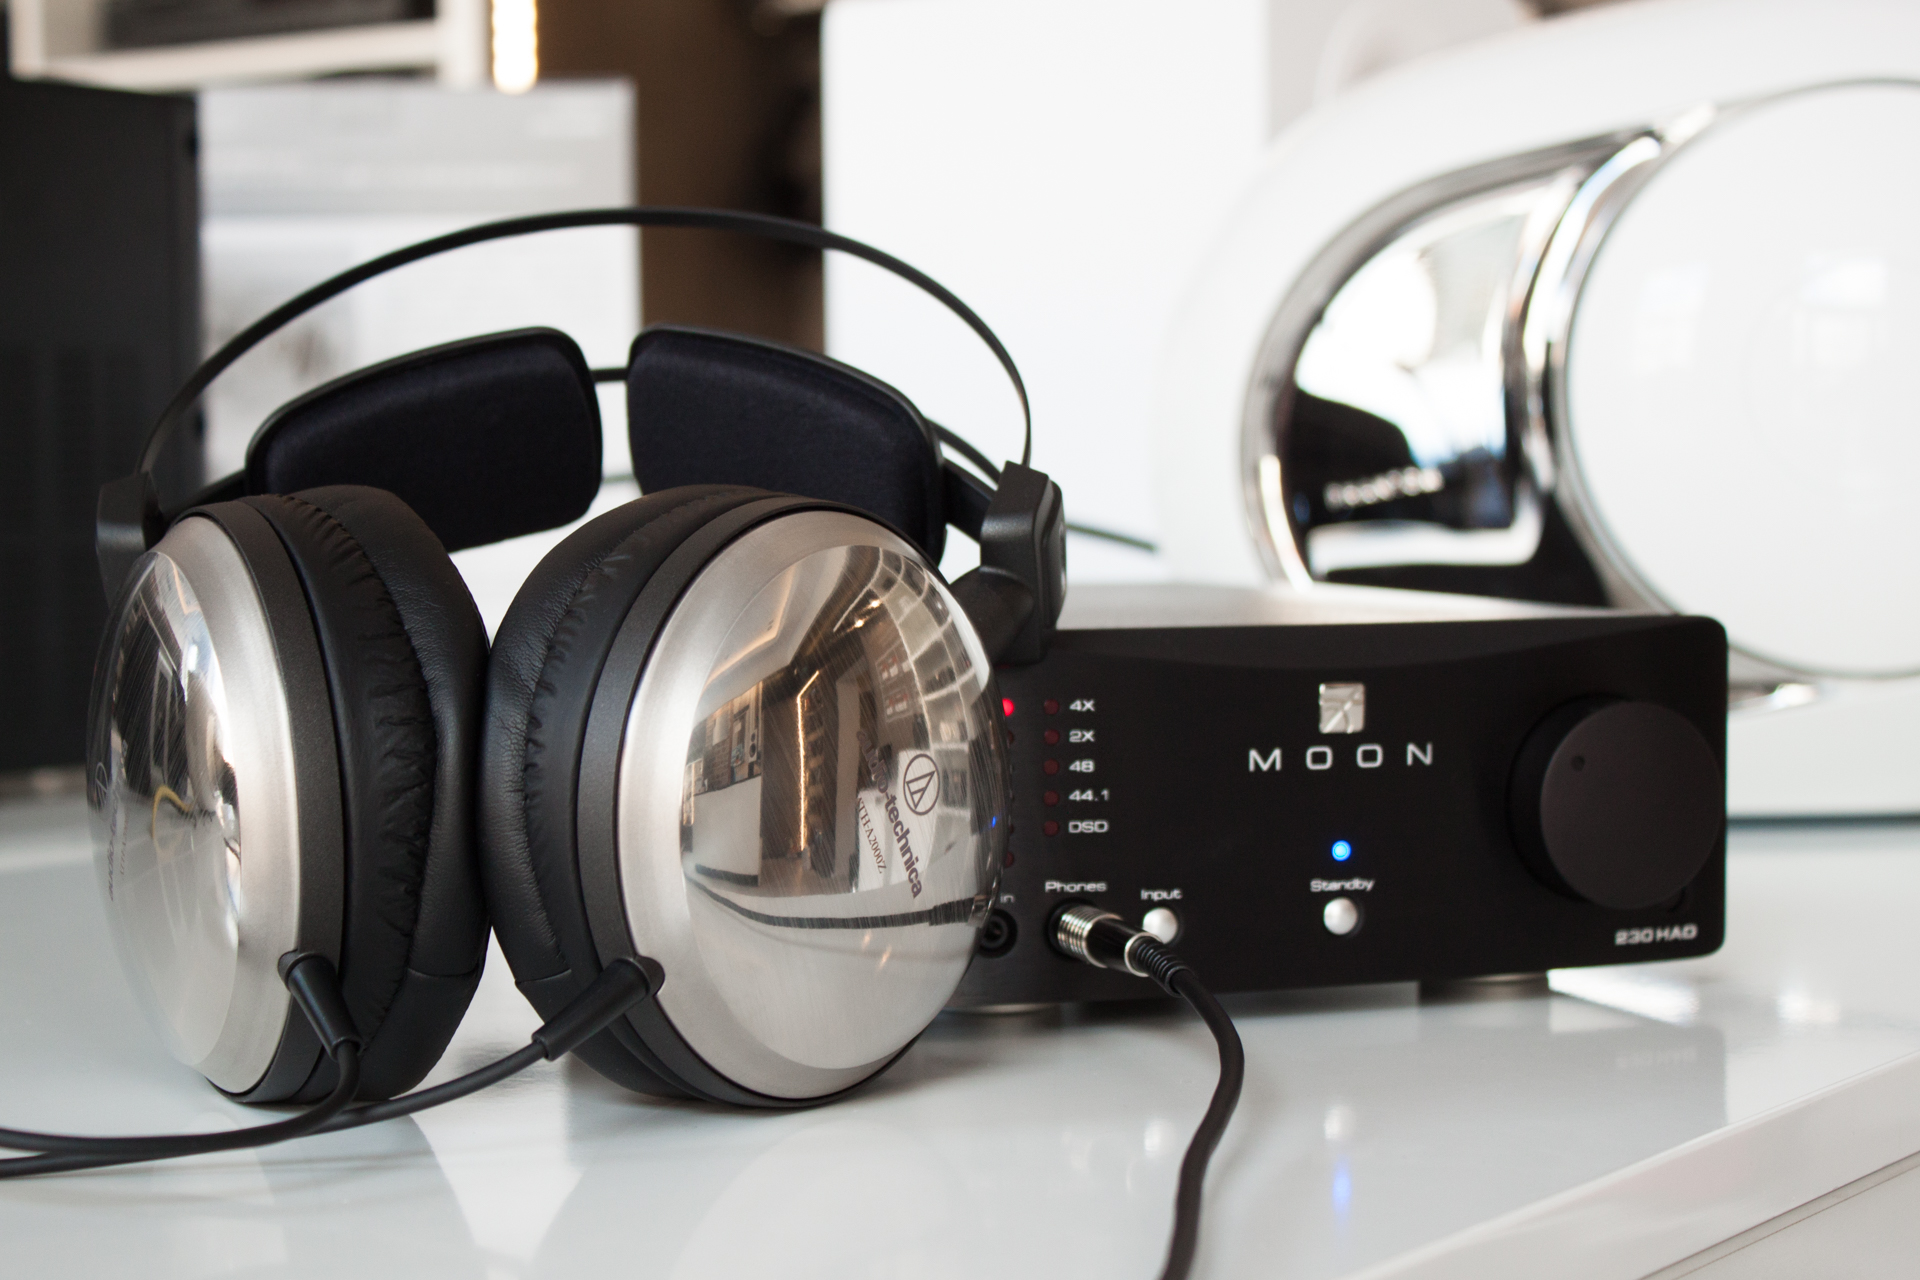 Cyk audio-technica